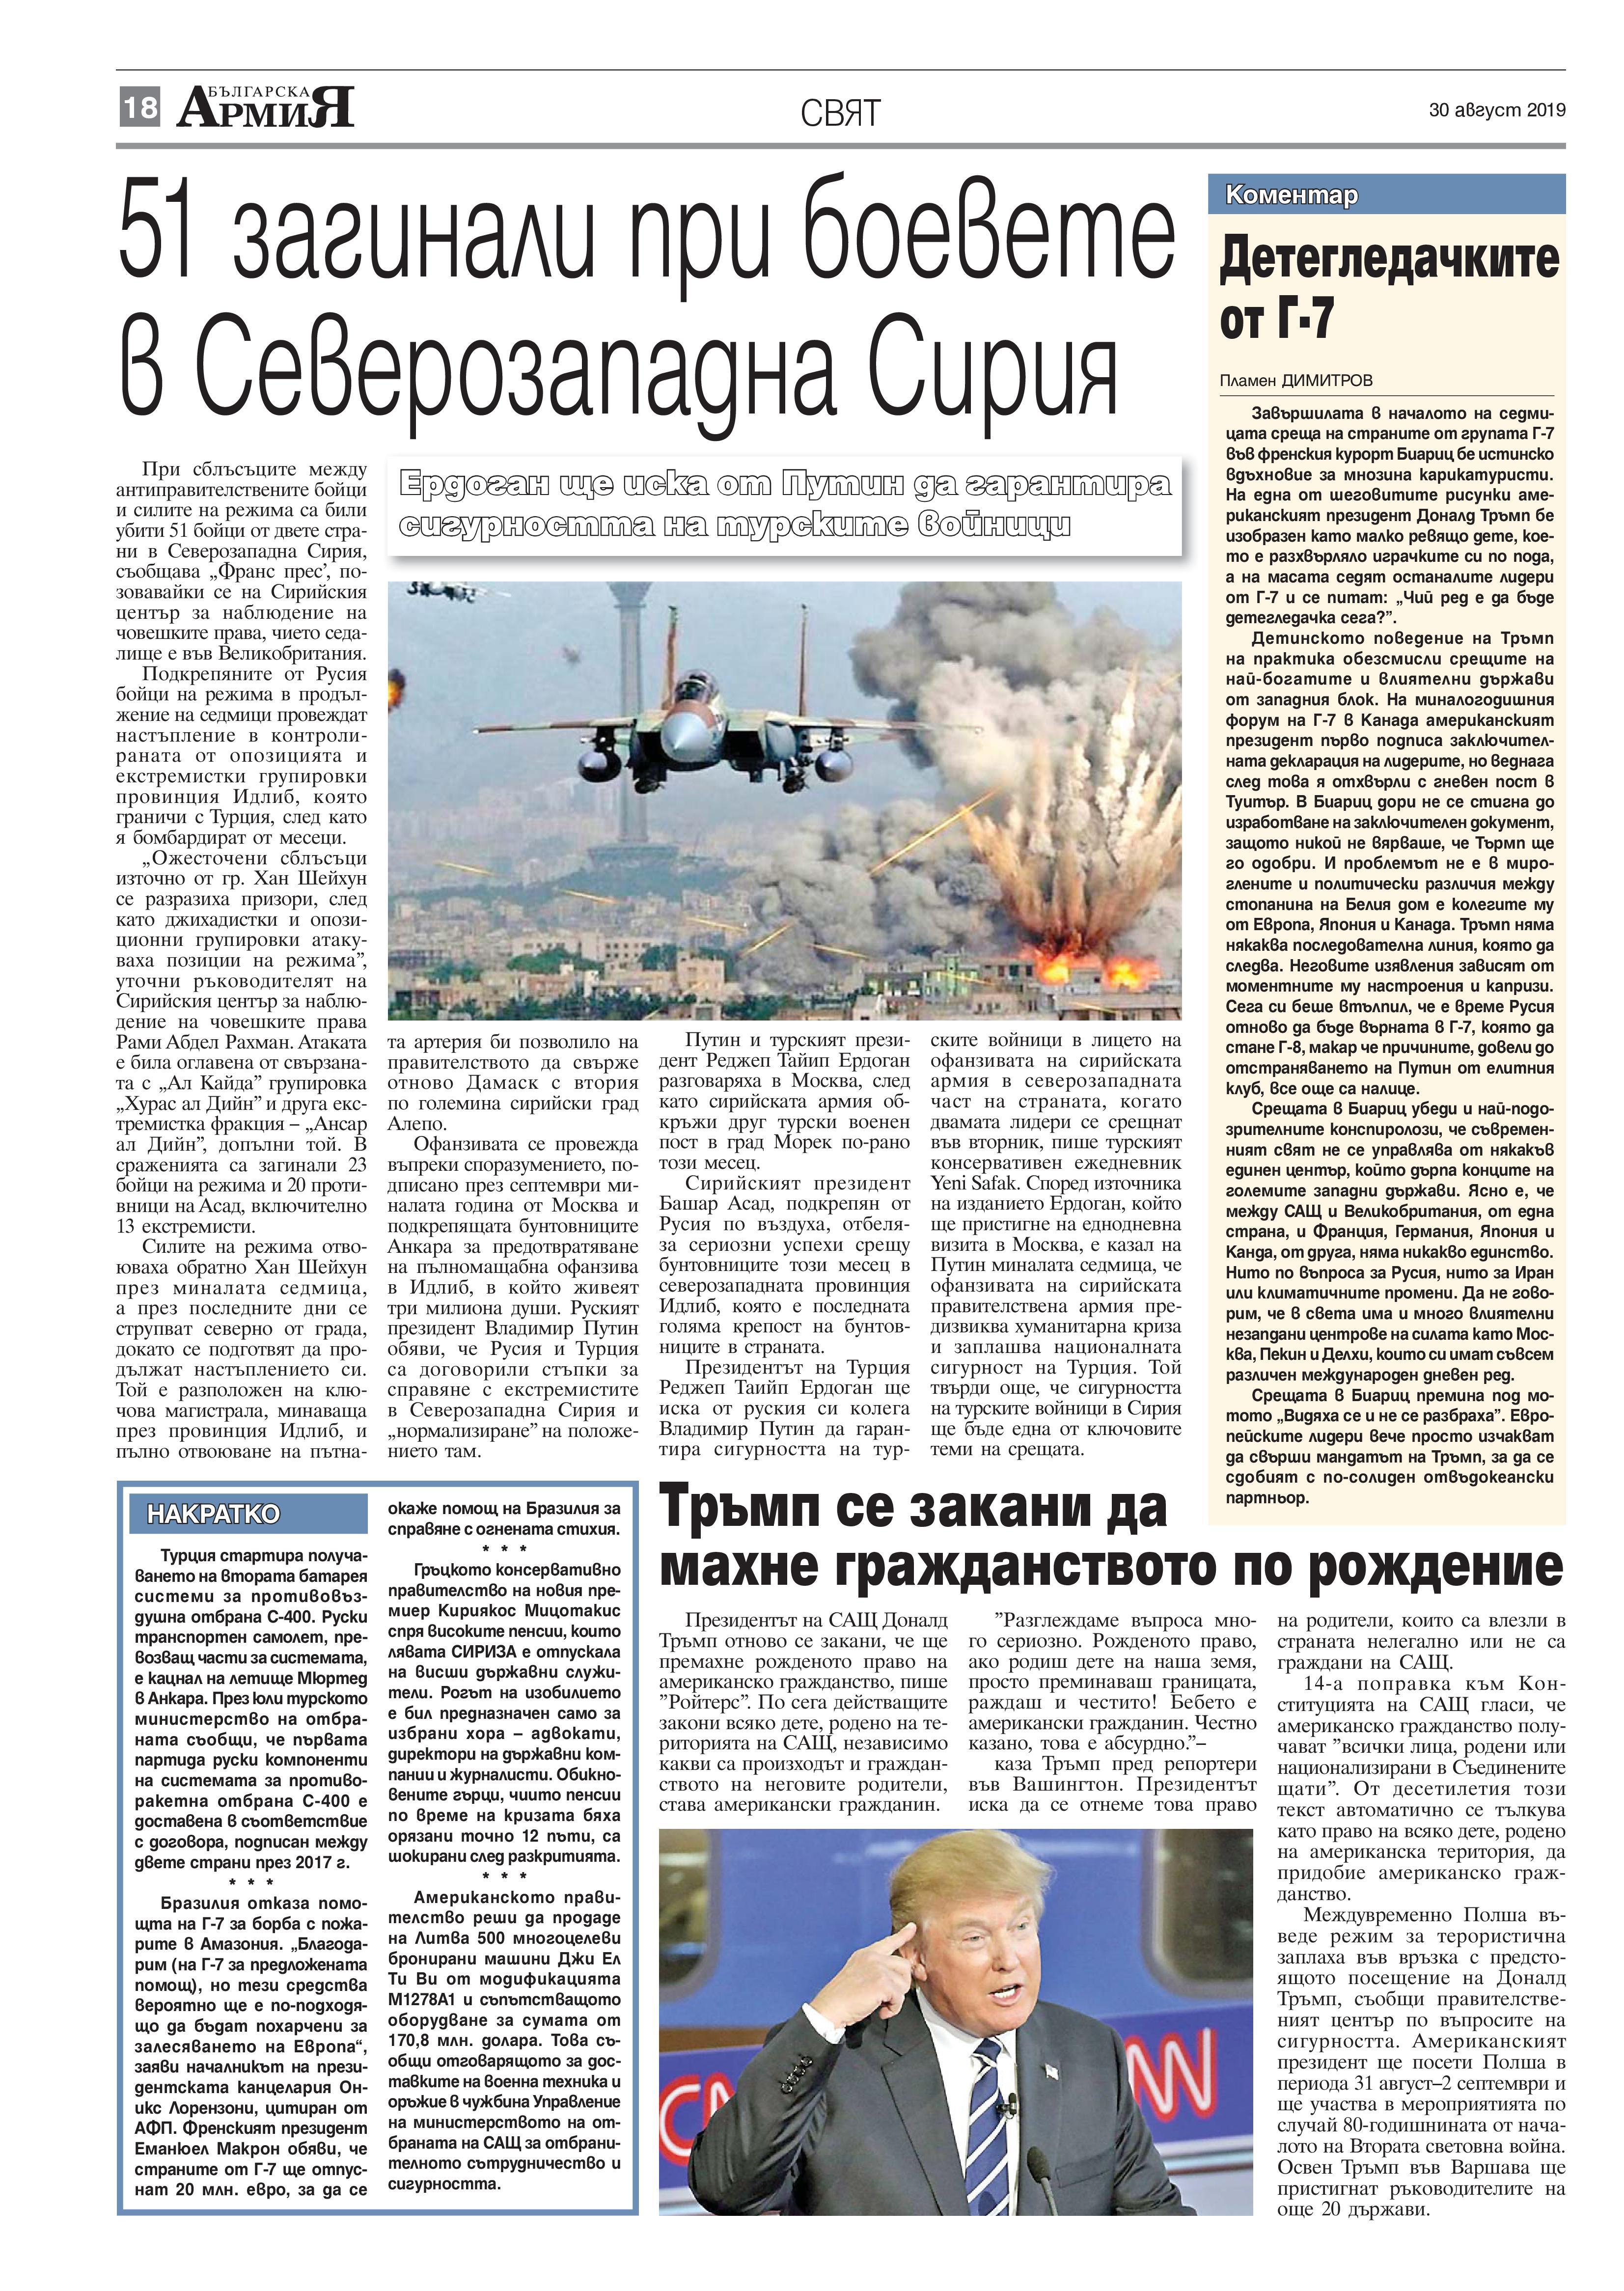 https://www.armymedia.bg/wp-content/uploads/2015/06/18-31.jpg